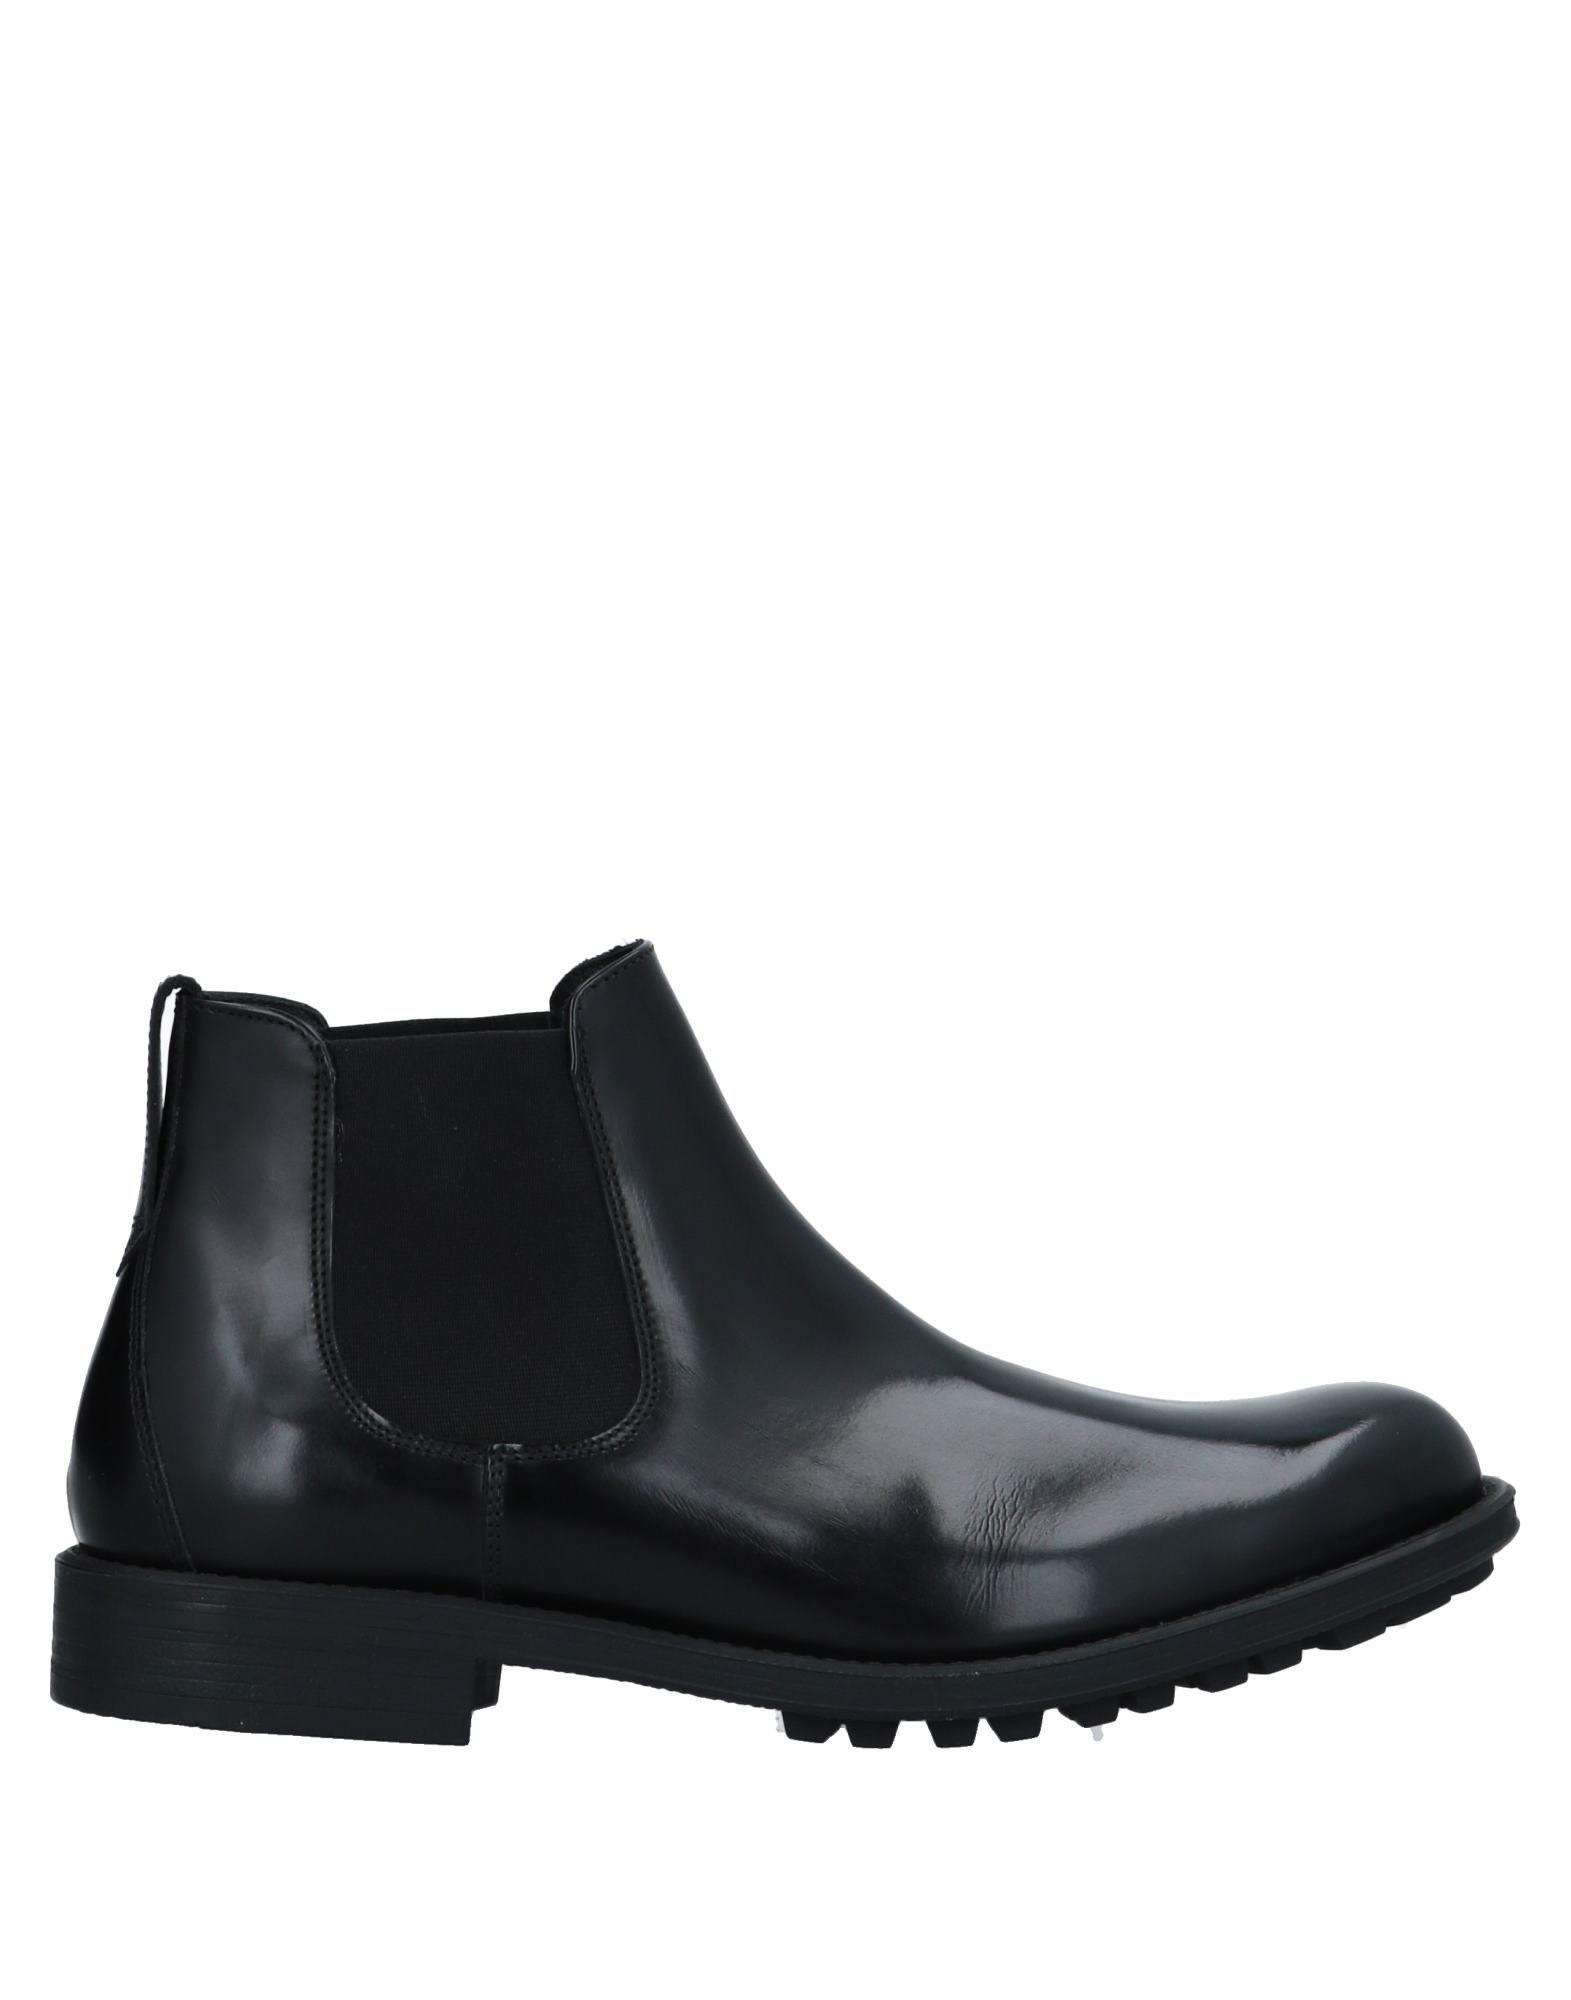 Rabatt echte Schuhe Antica Cuoieria Stiefelette Herren  11537554XE